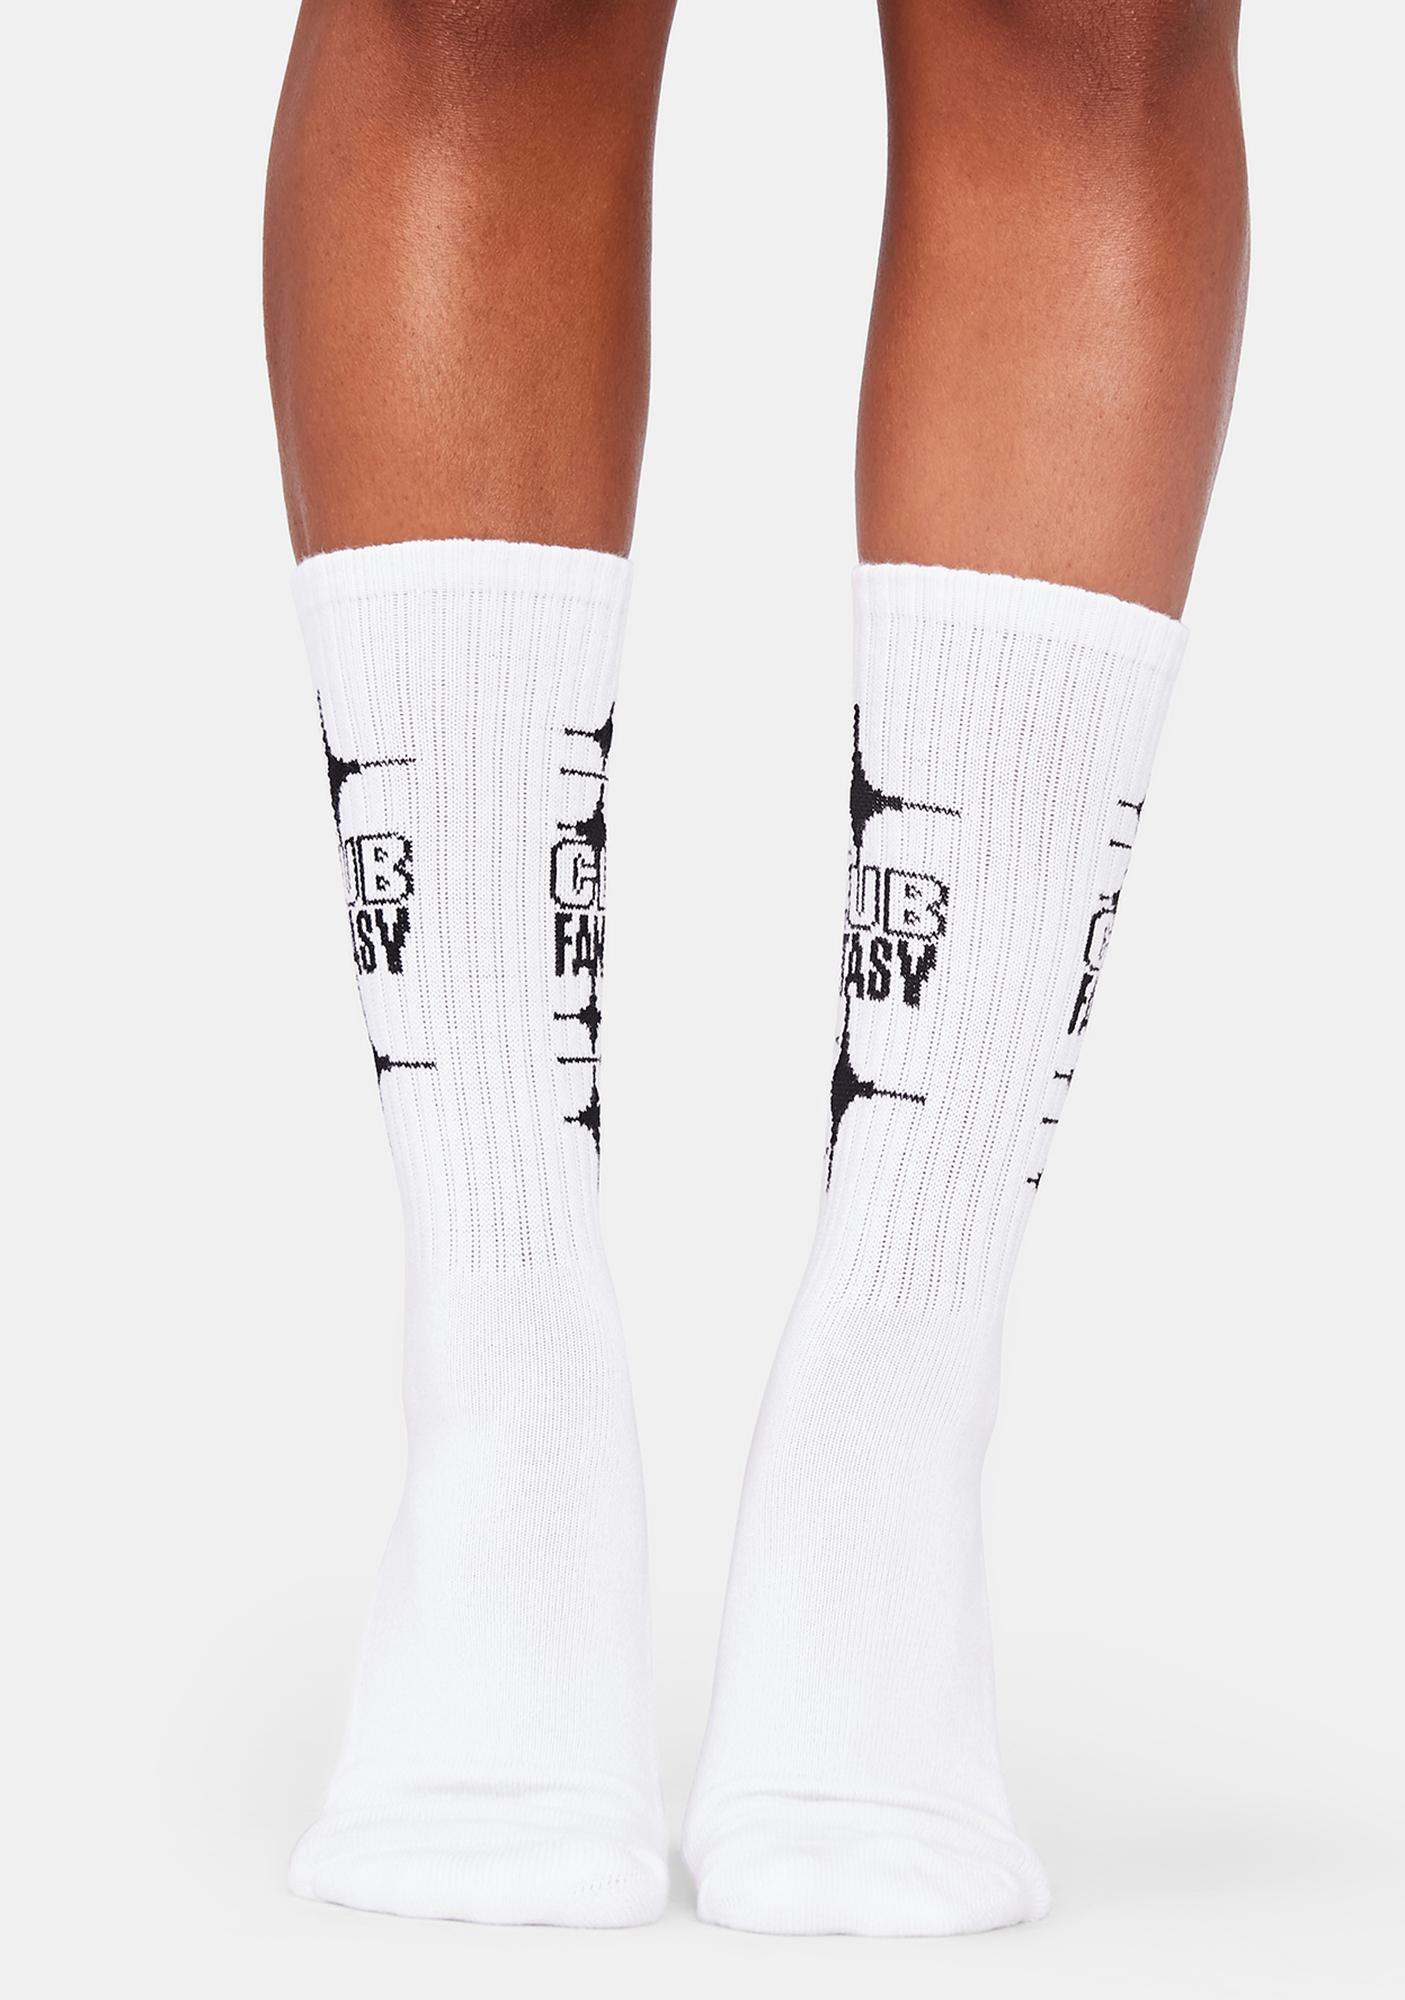 Club Fantasy Stars Crew Socks